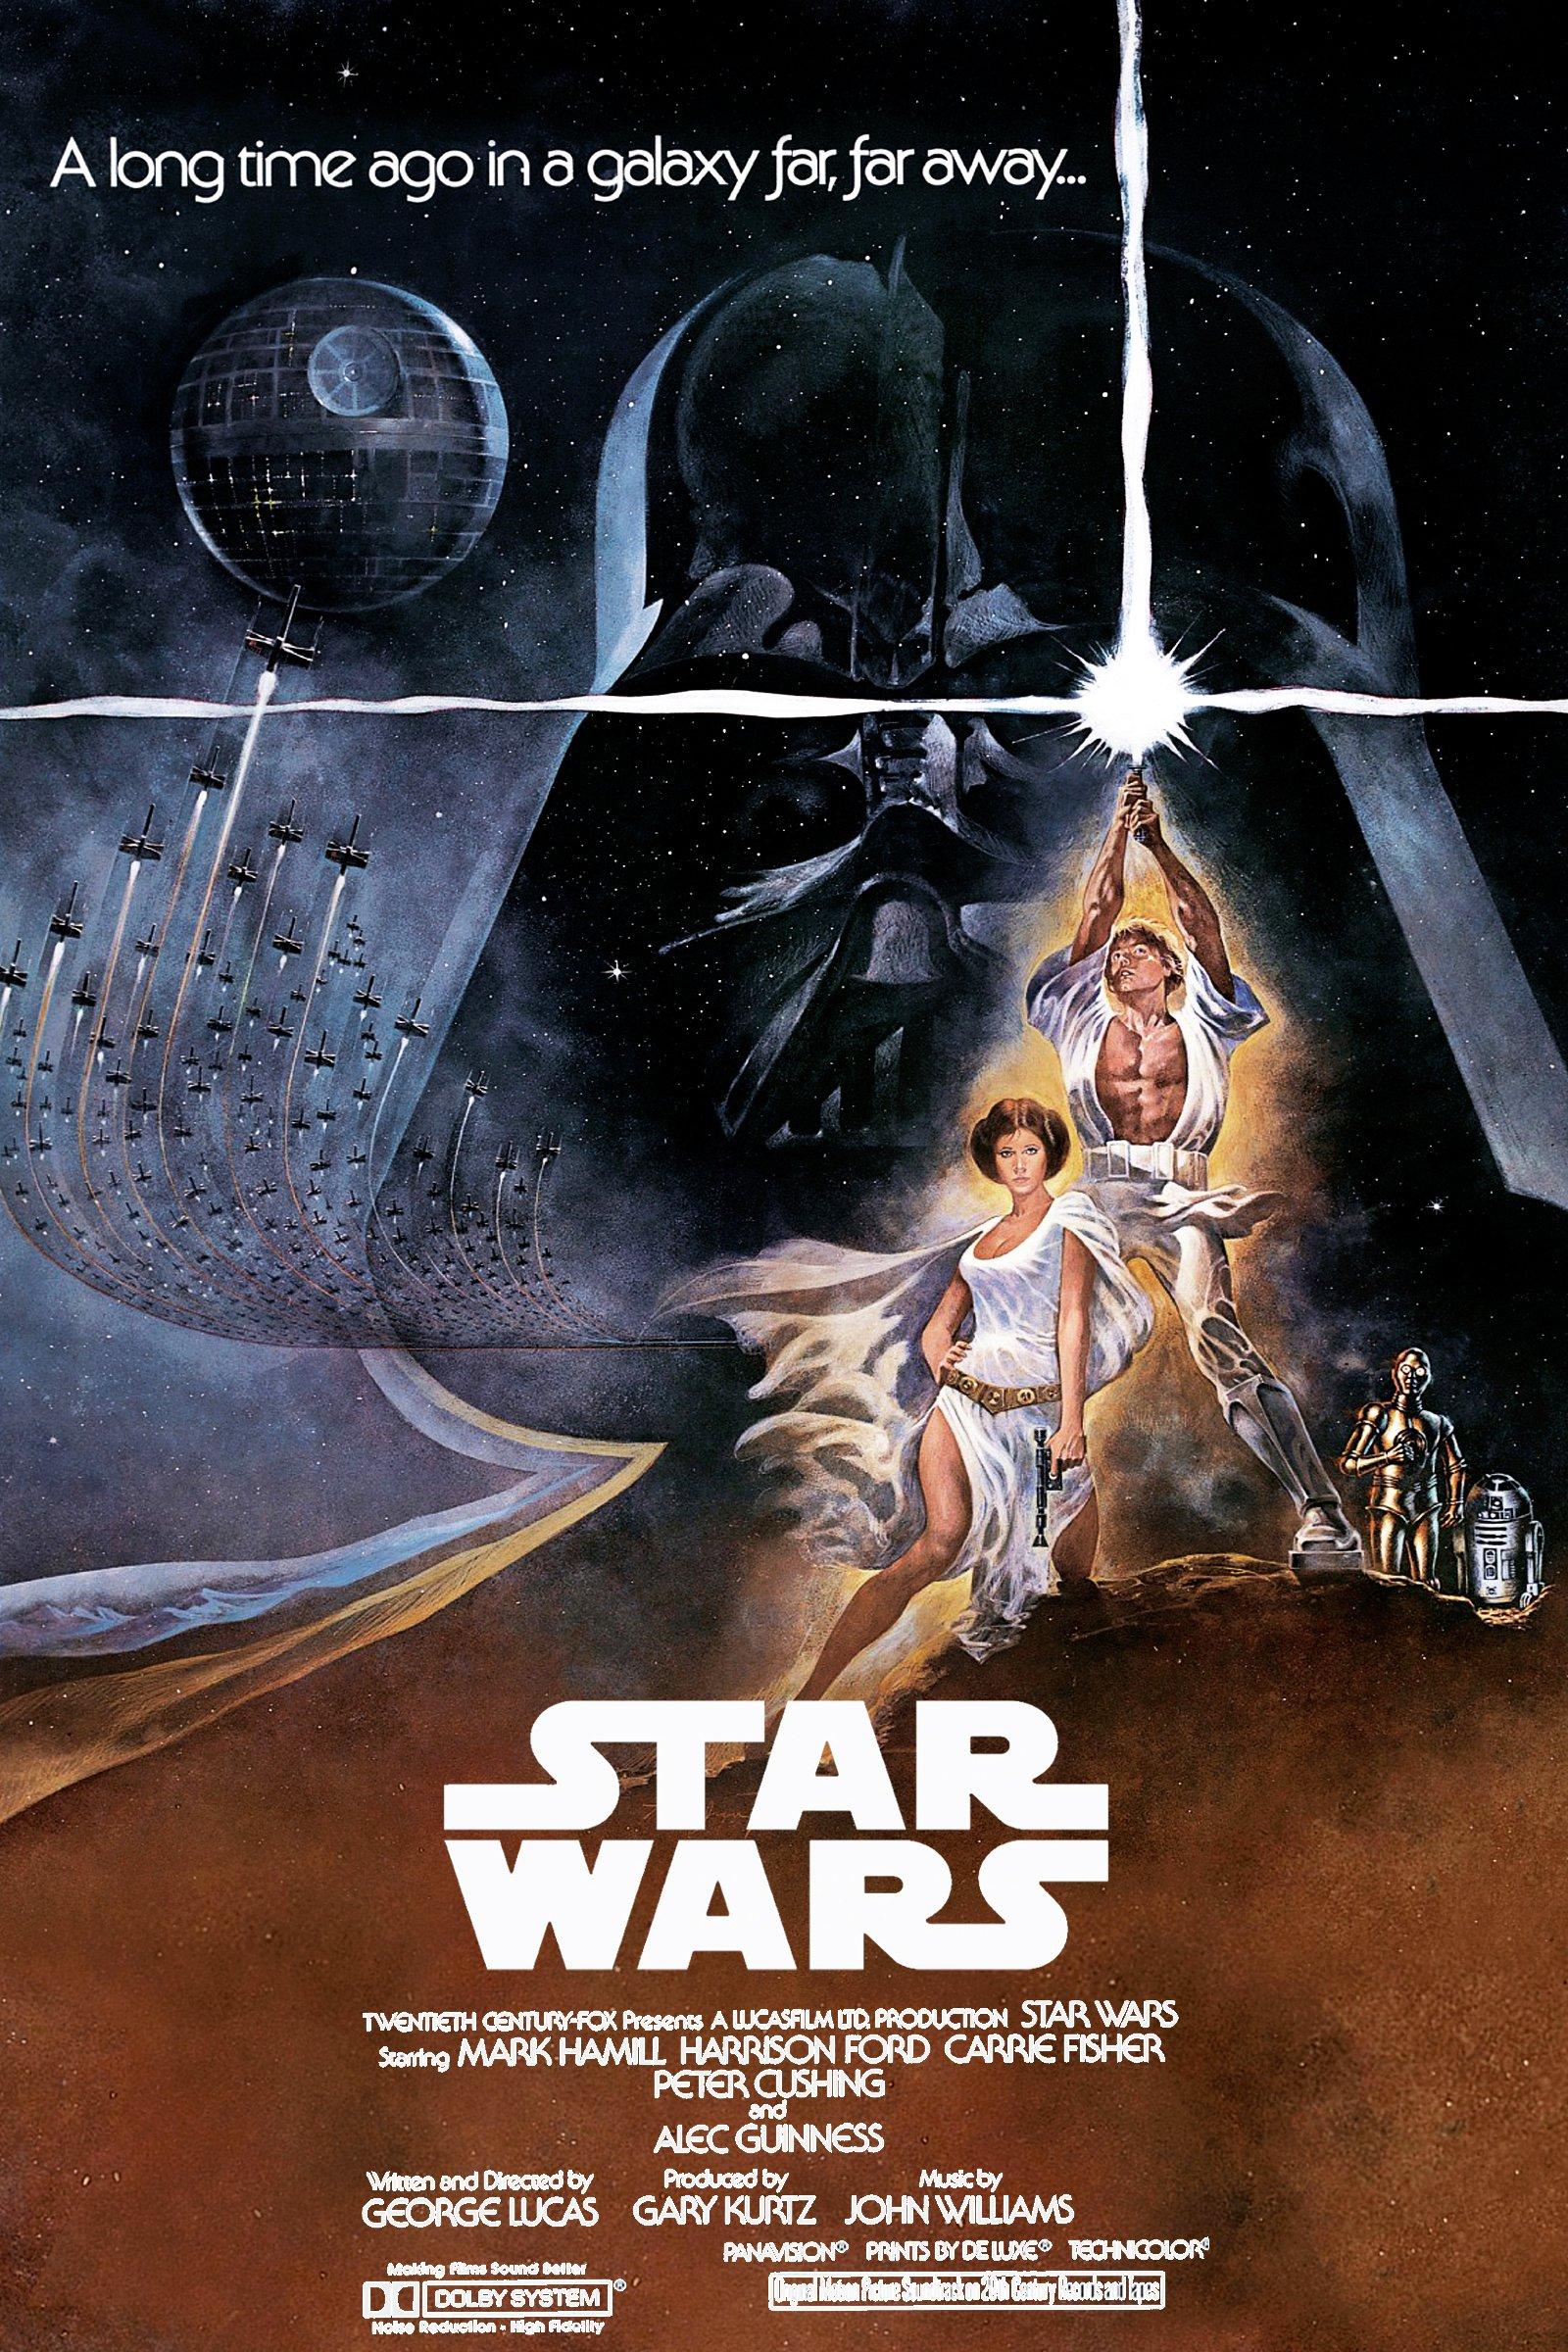 49 1977 Star Wars Wallpaper On Wallpapersafari